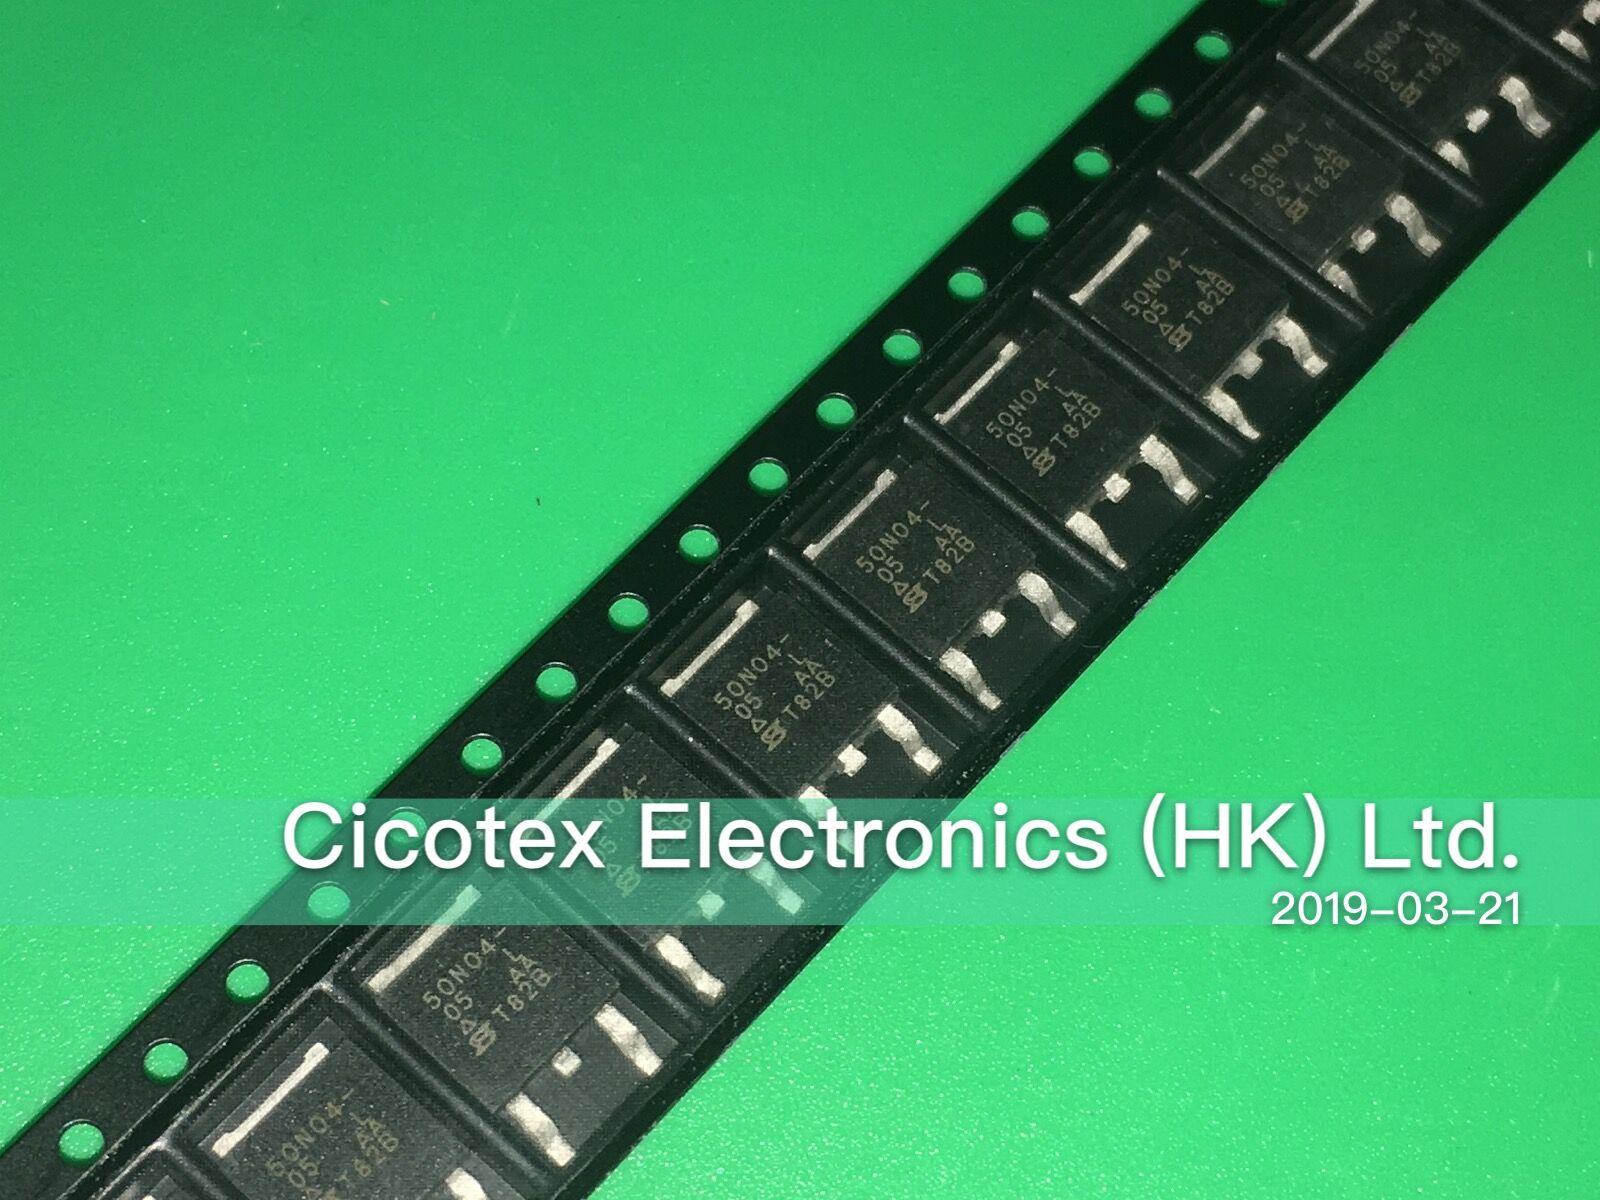 10 pçs/lote SUD50N04-05L-E3 PARA-252 50N04-05L 40 V 115A TO252 DPAK MOSFET N-CH SUD 50N04-05L 50N04 SUD50N04-05L